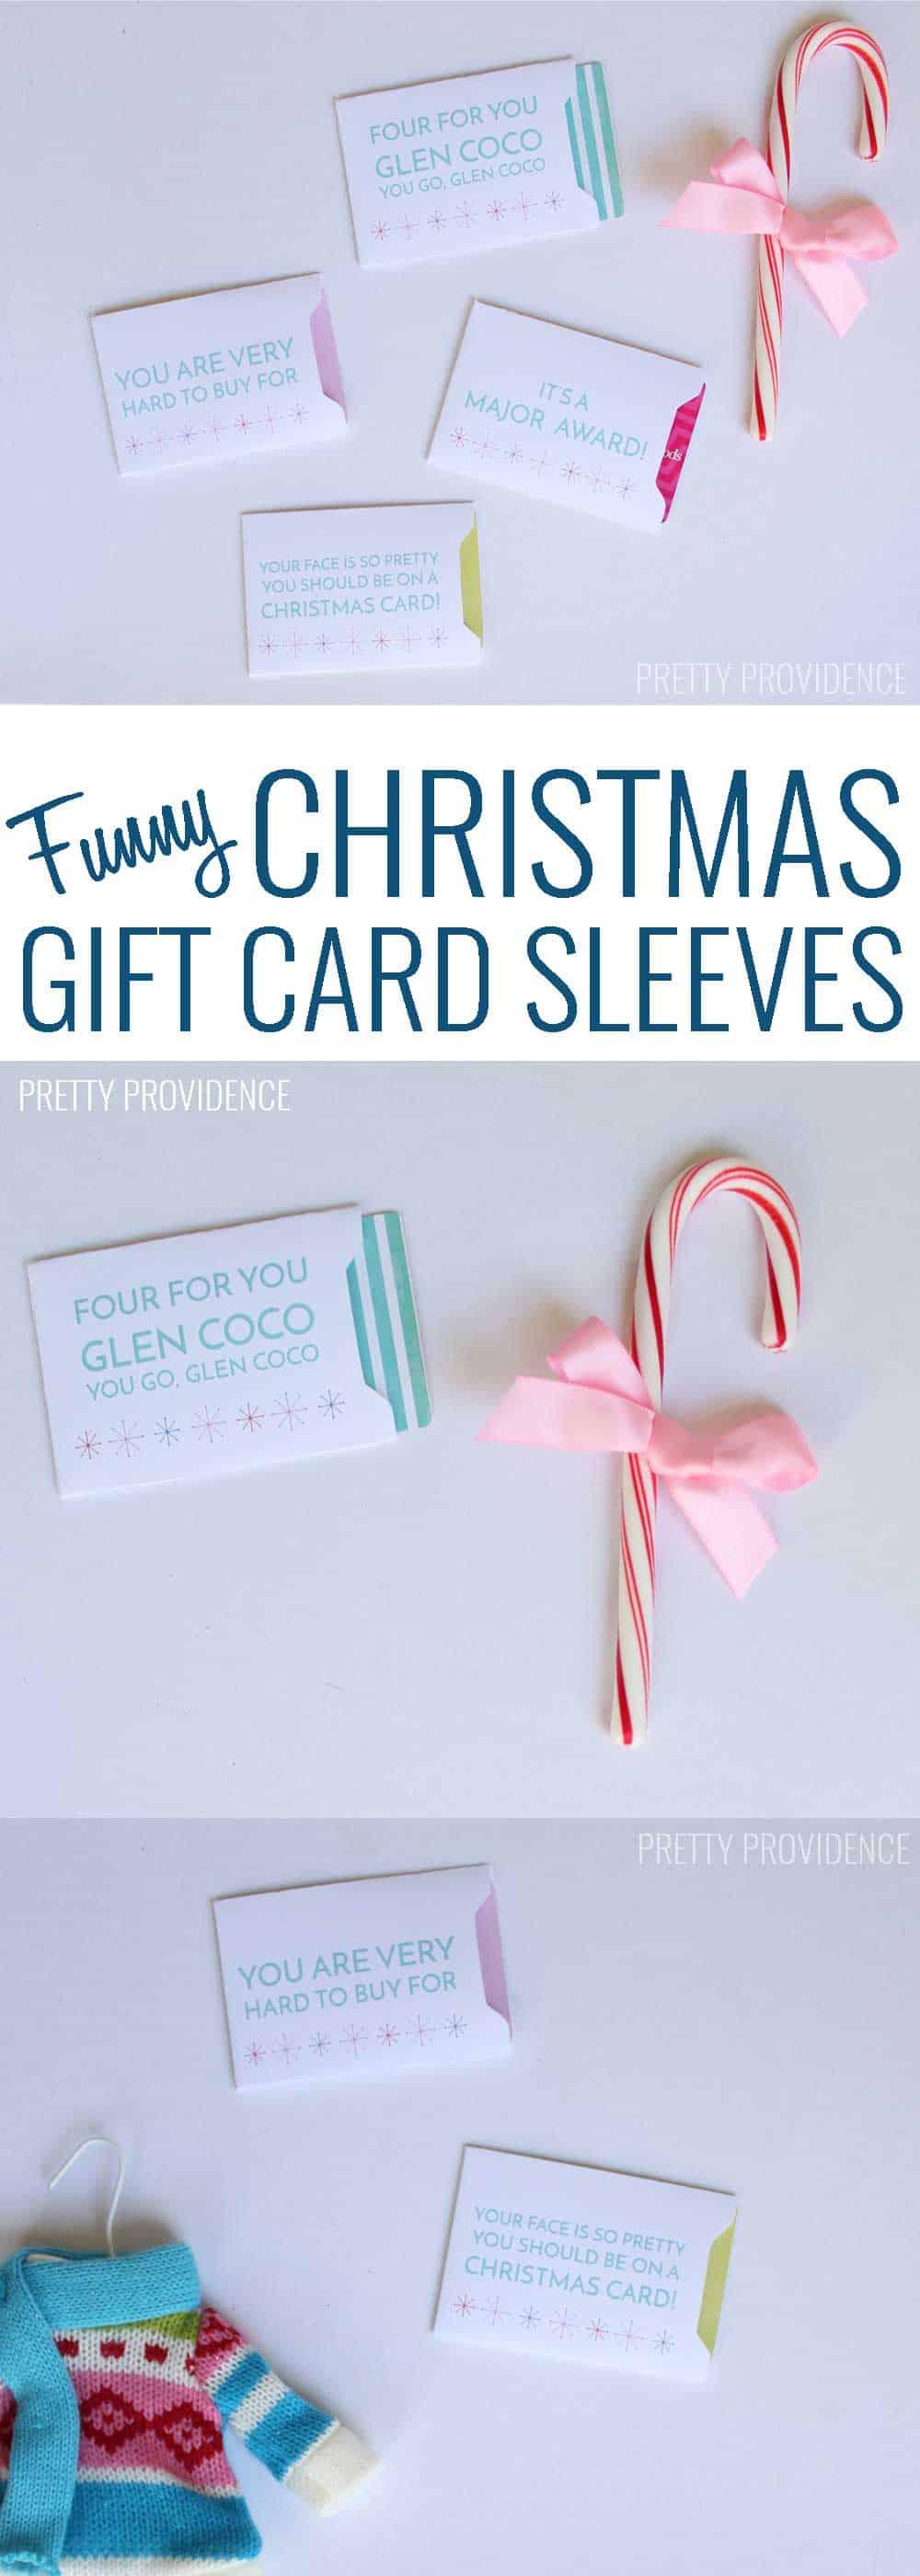 gift-card-sleeves-christmas-pin